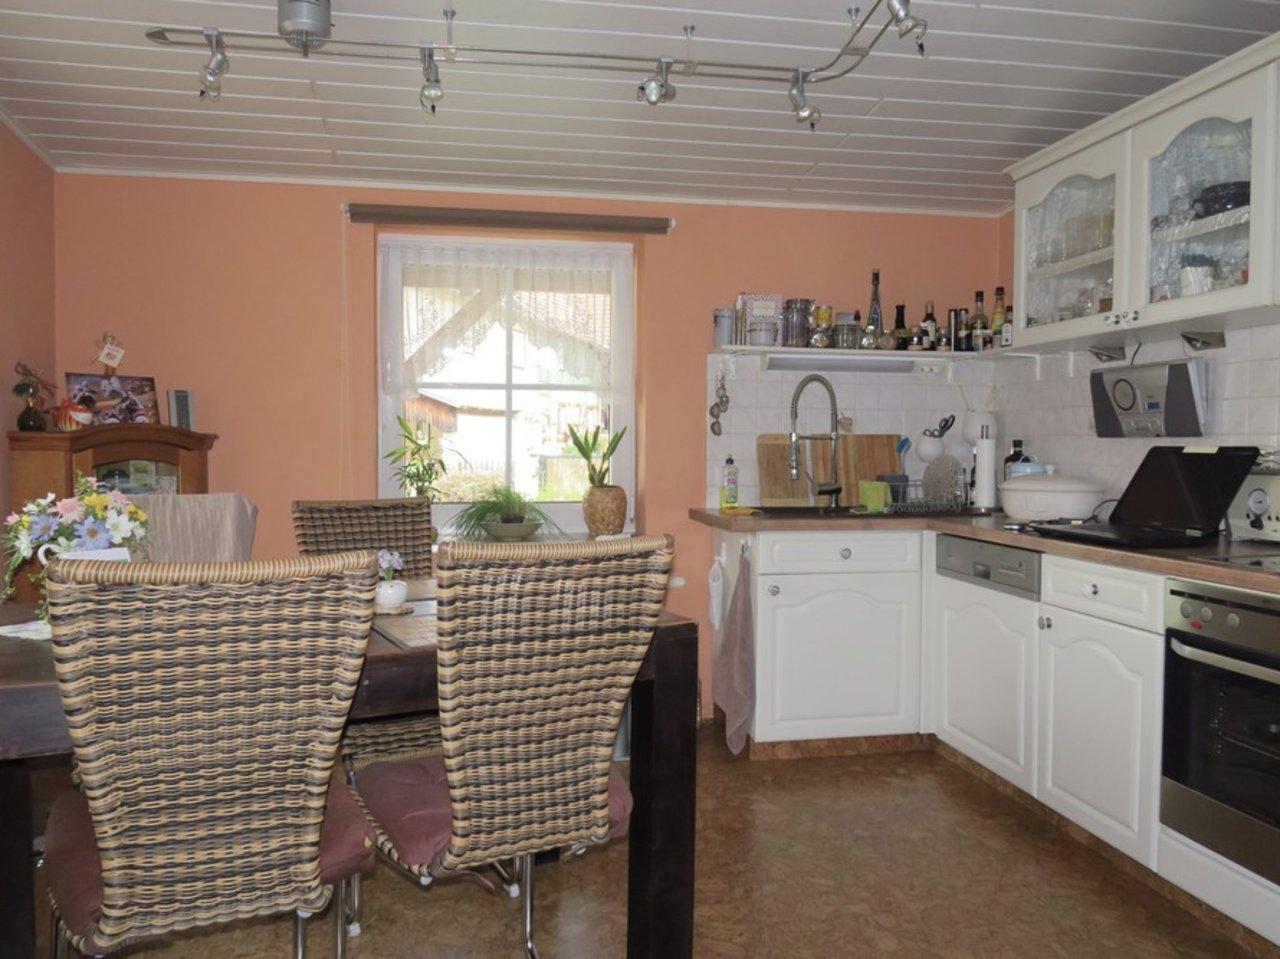 Komplett modernisiertes Zweifamilienhaus in Kettmannshausen-Küche im OG